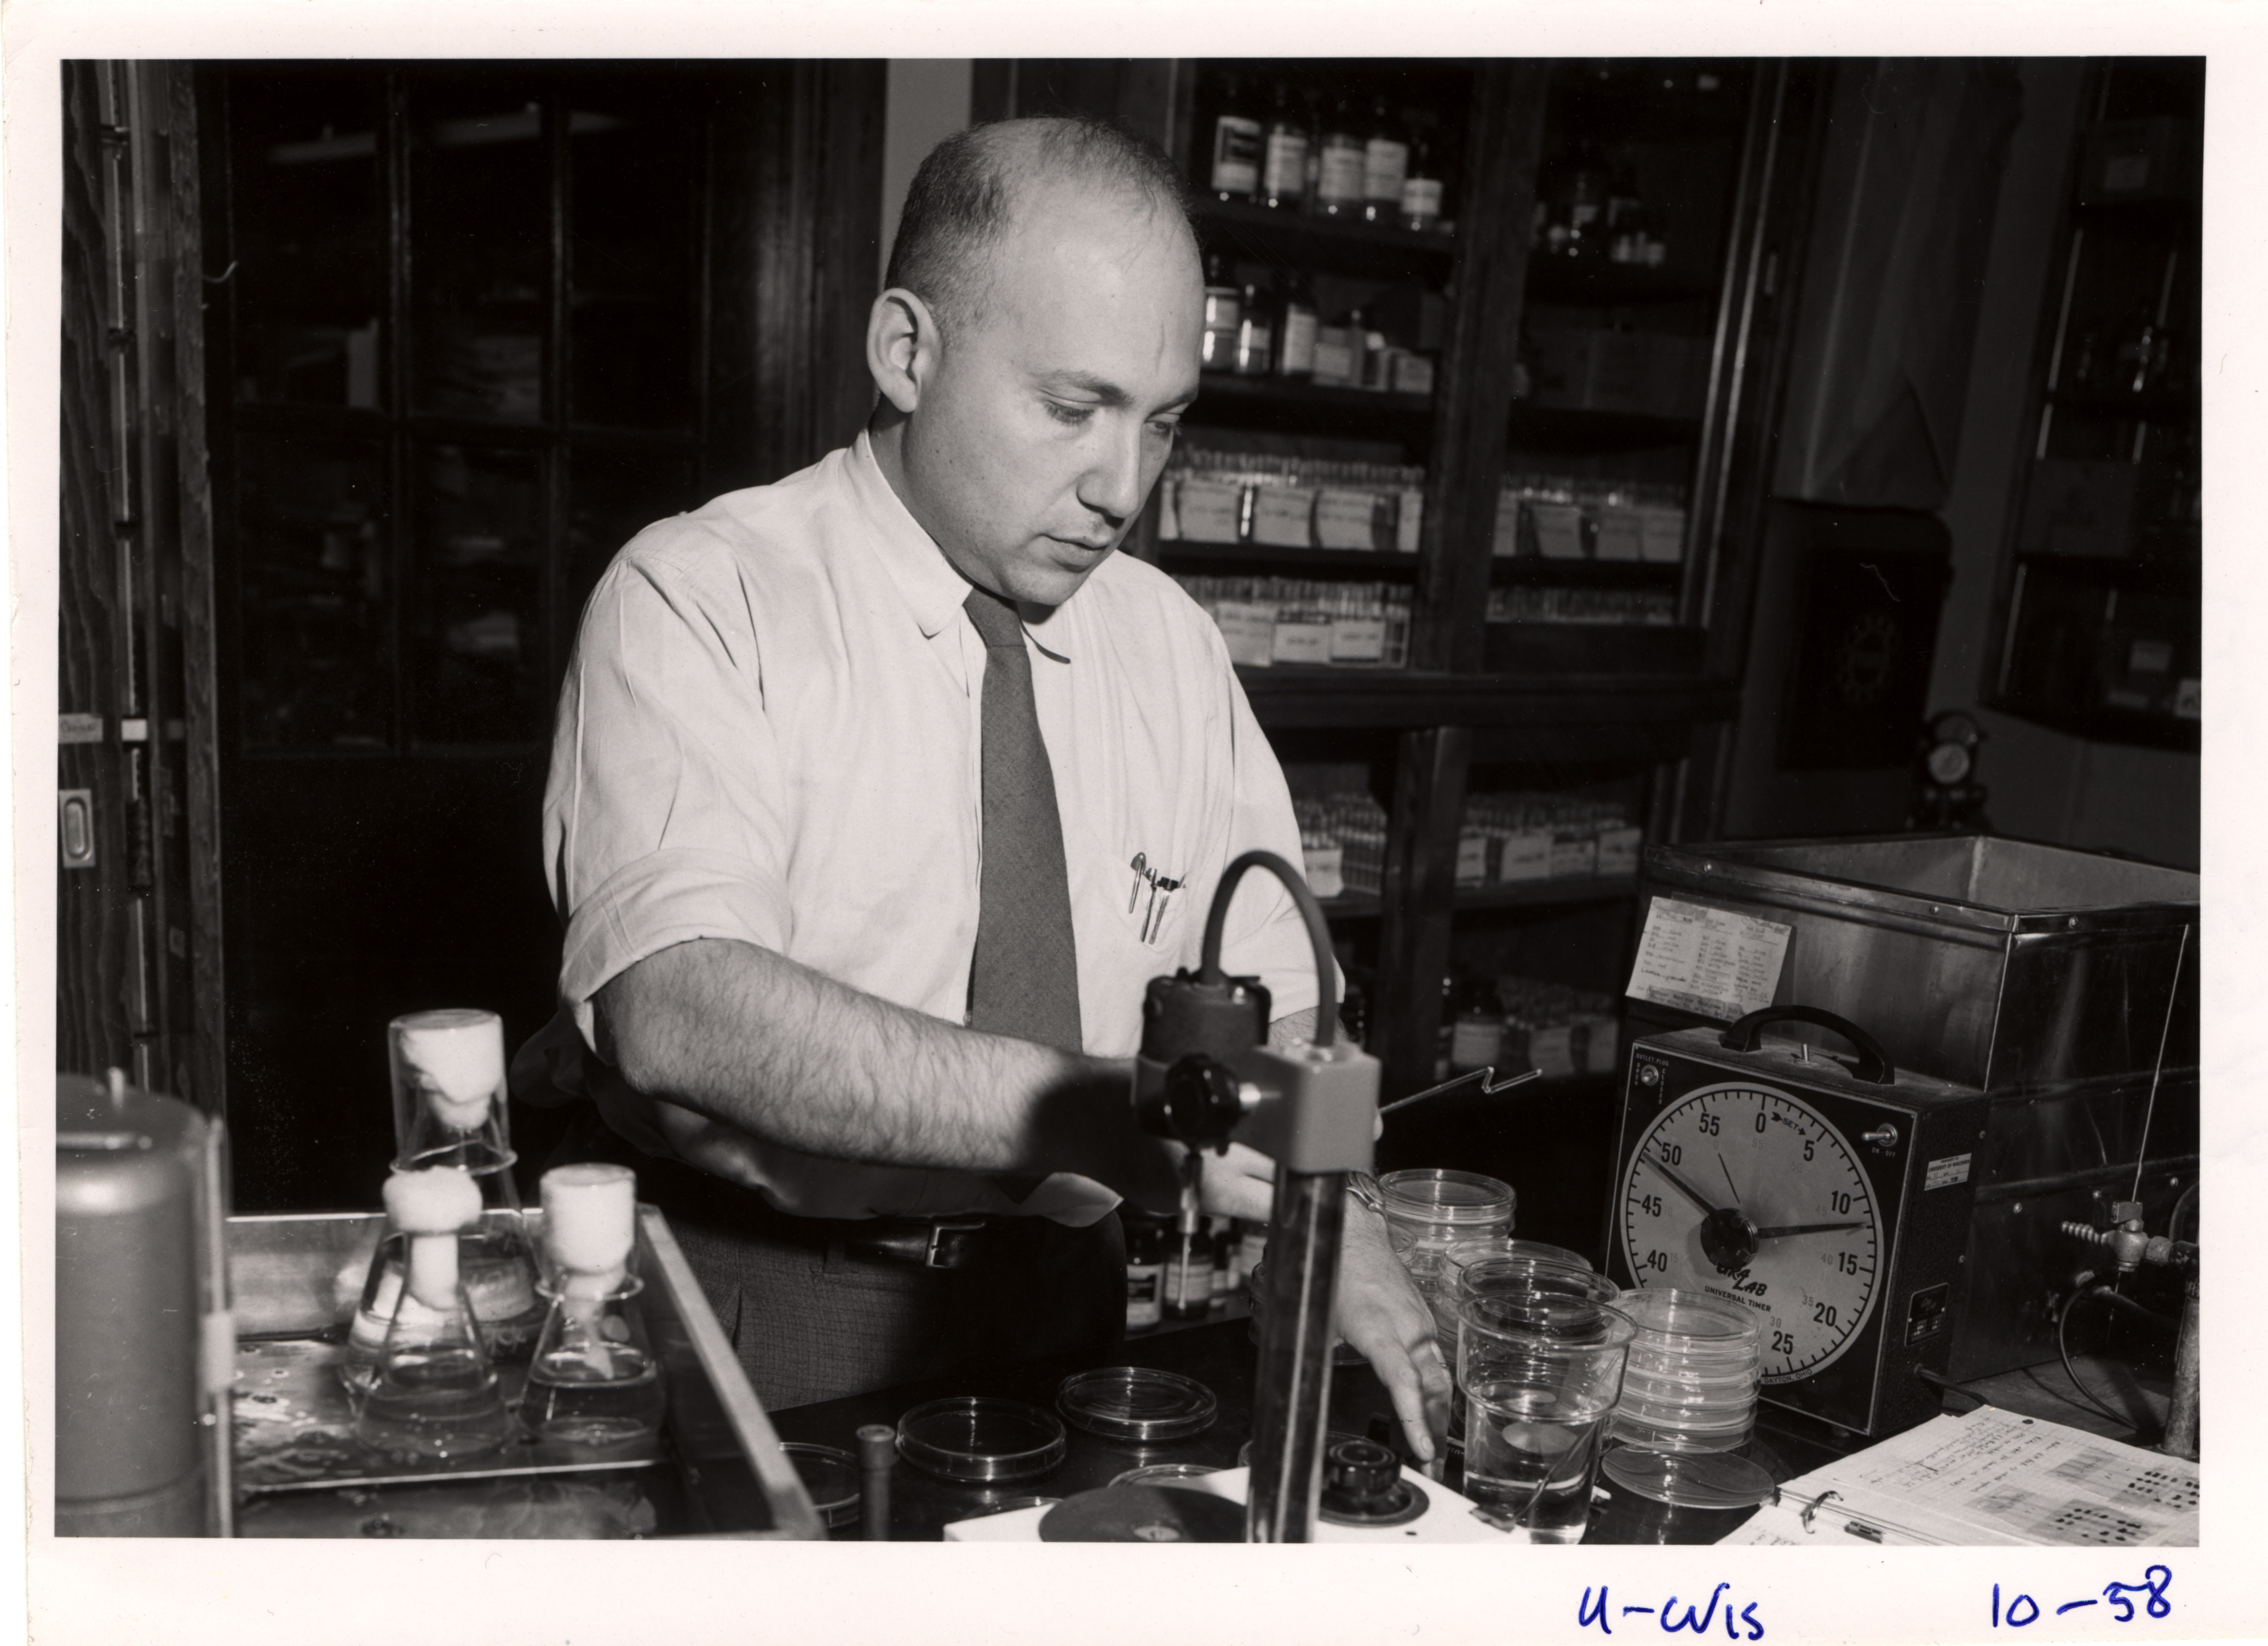 Molecular biologist, Joshua Lederberg, in his lab.